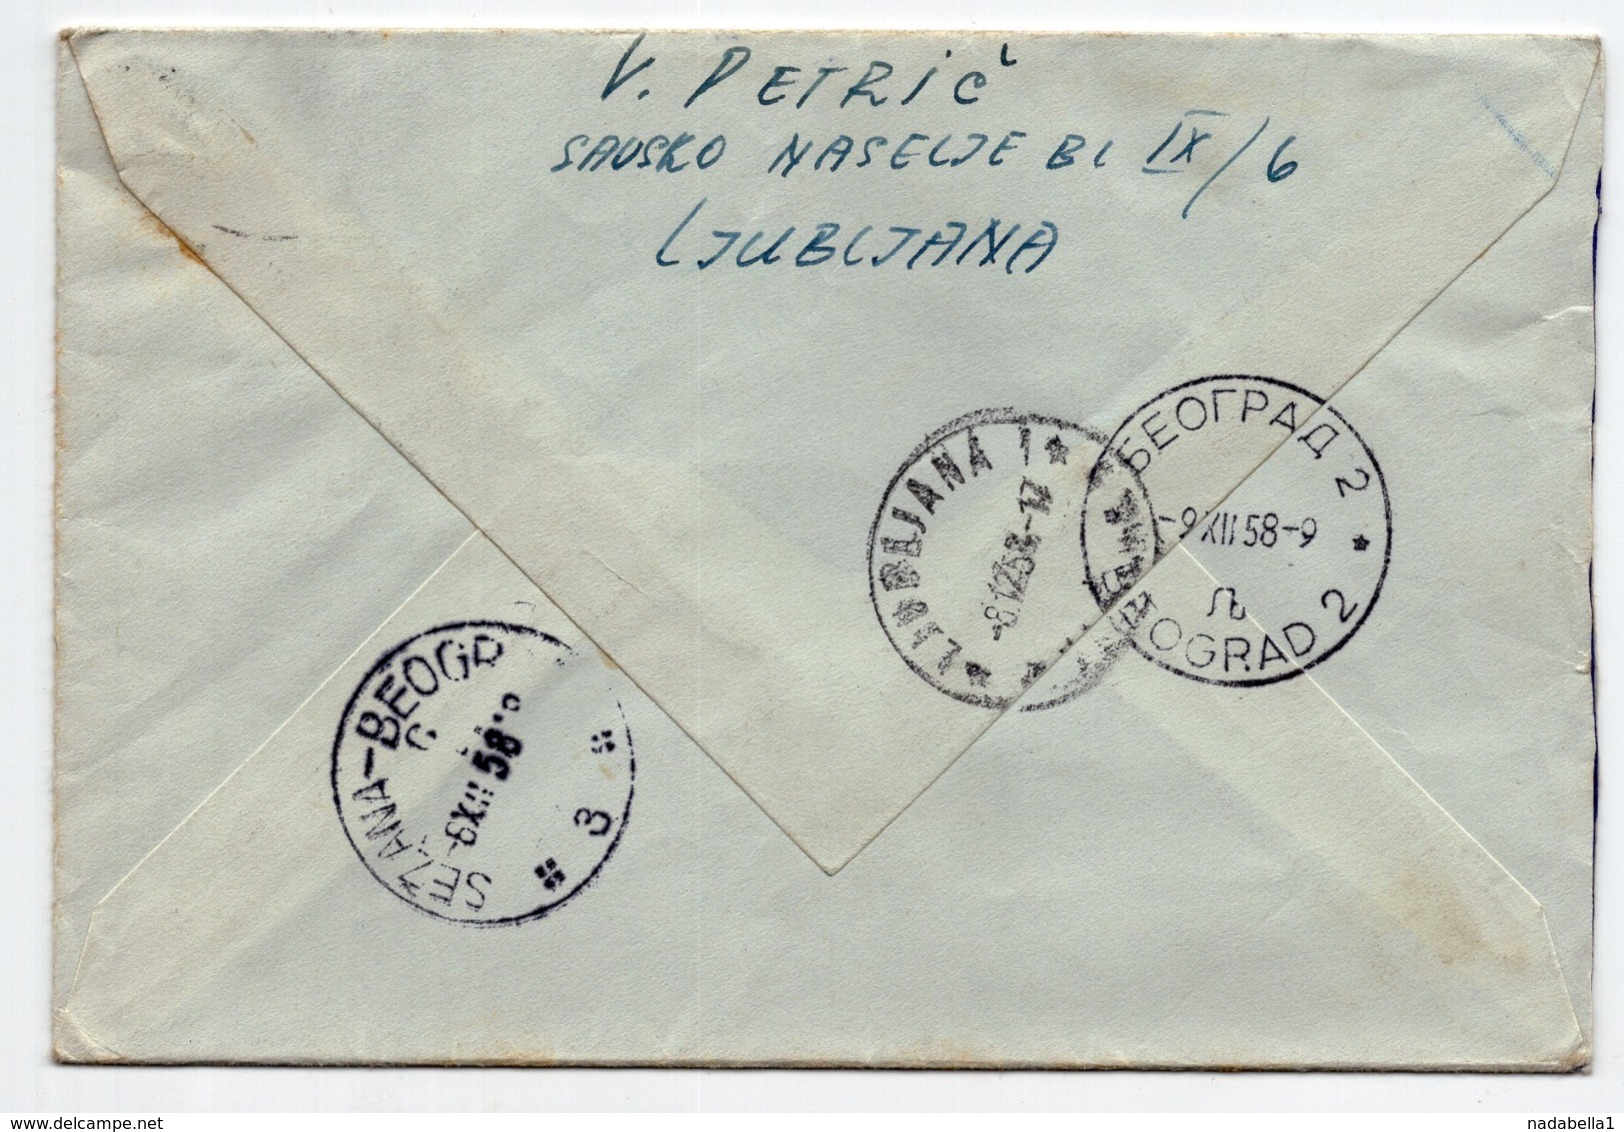 1958 YUGOSLAVIA, SLOVENIA, LJUBLJANA TO BELGRADE, TPO 3 SEZANA-BELGRADE, REGISTERED, EXPRESS MAIL - 1945-1992 Socialist Federal Republic Of Yugoslavia